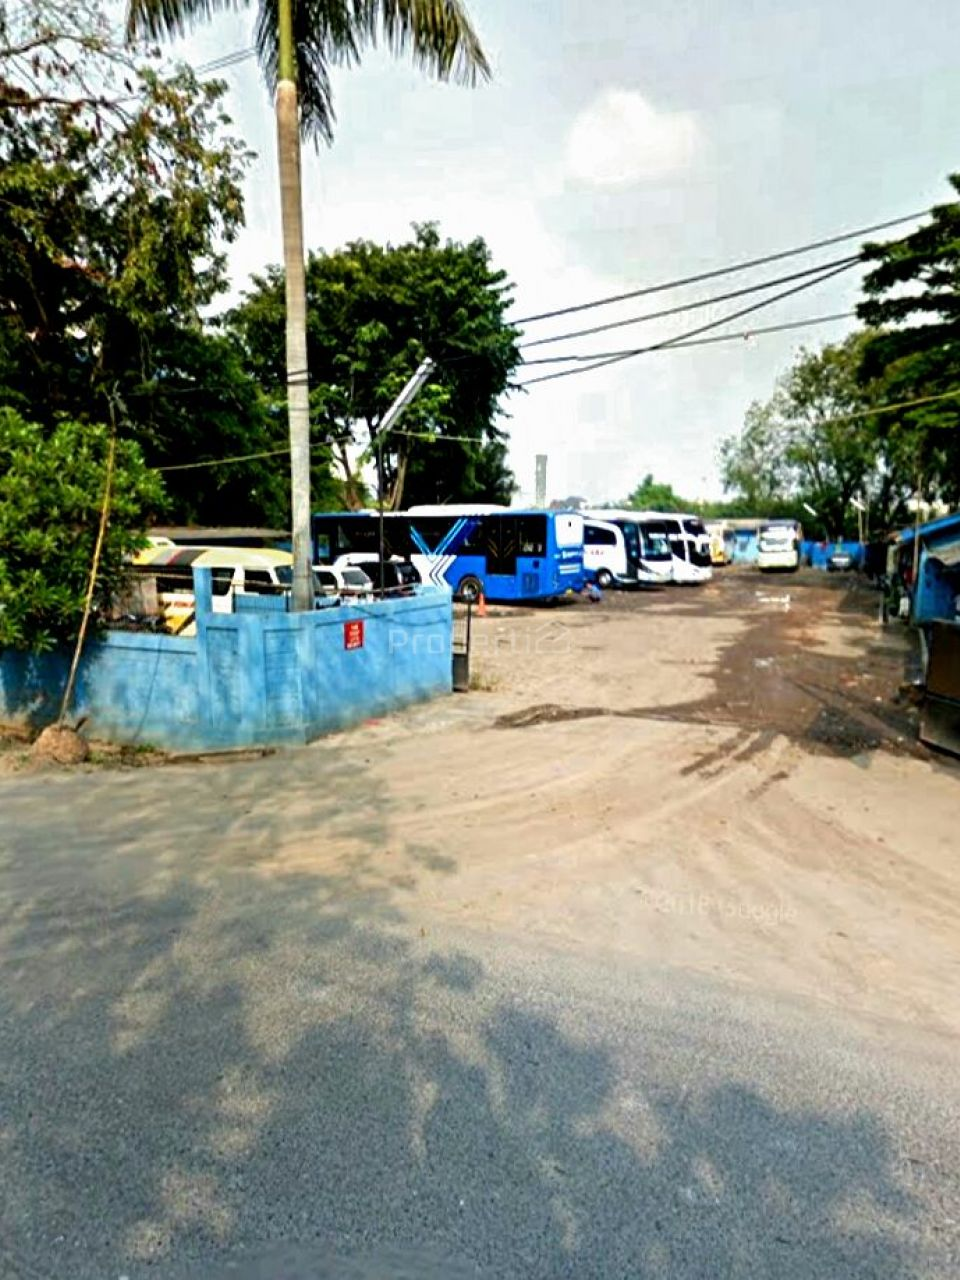 Land for Housing and Warehouse in Kelapa Gading, DKI Jakarta